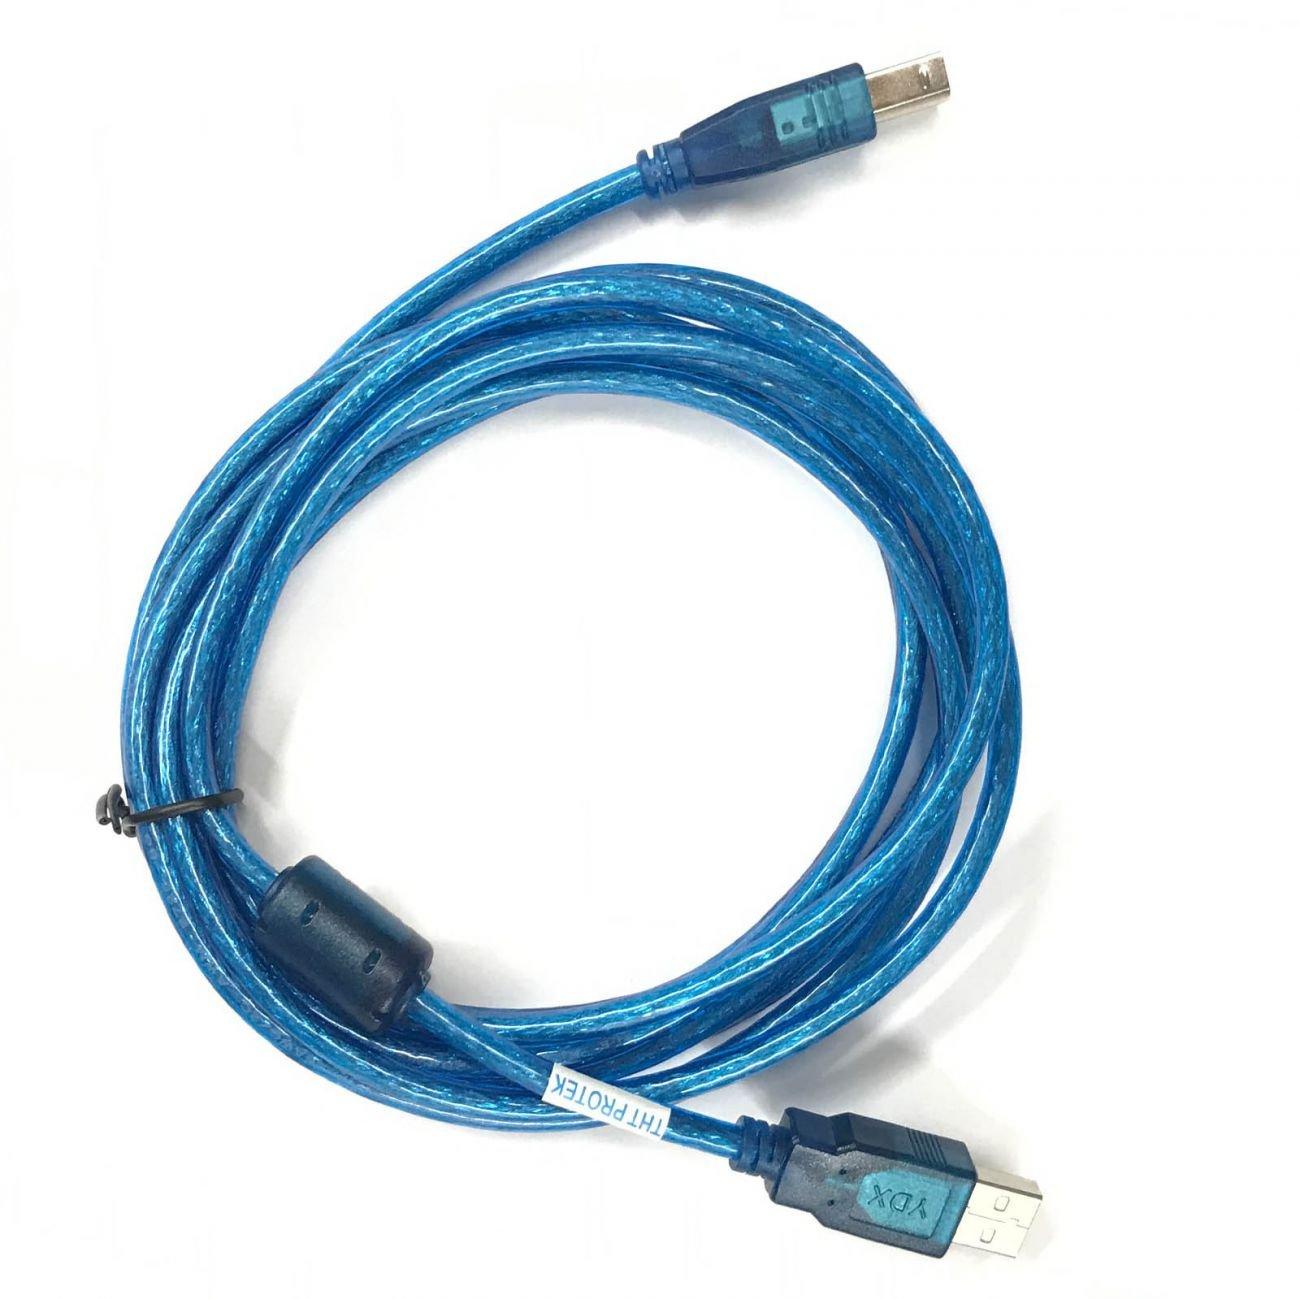 Cable USB 2.0 Impresora para HP Deskjet 3720 All-in-One: Amazon.es ...